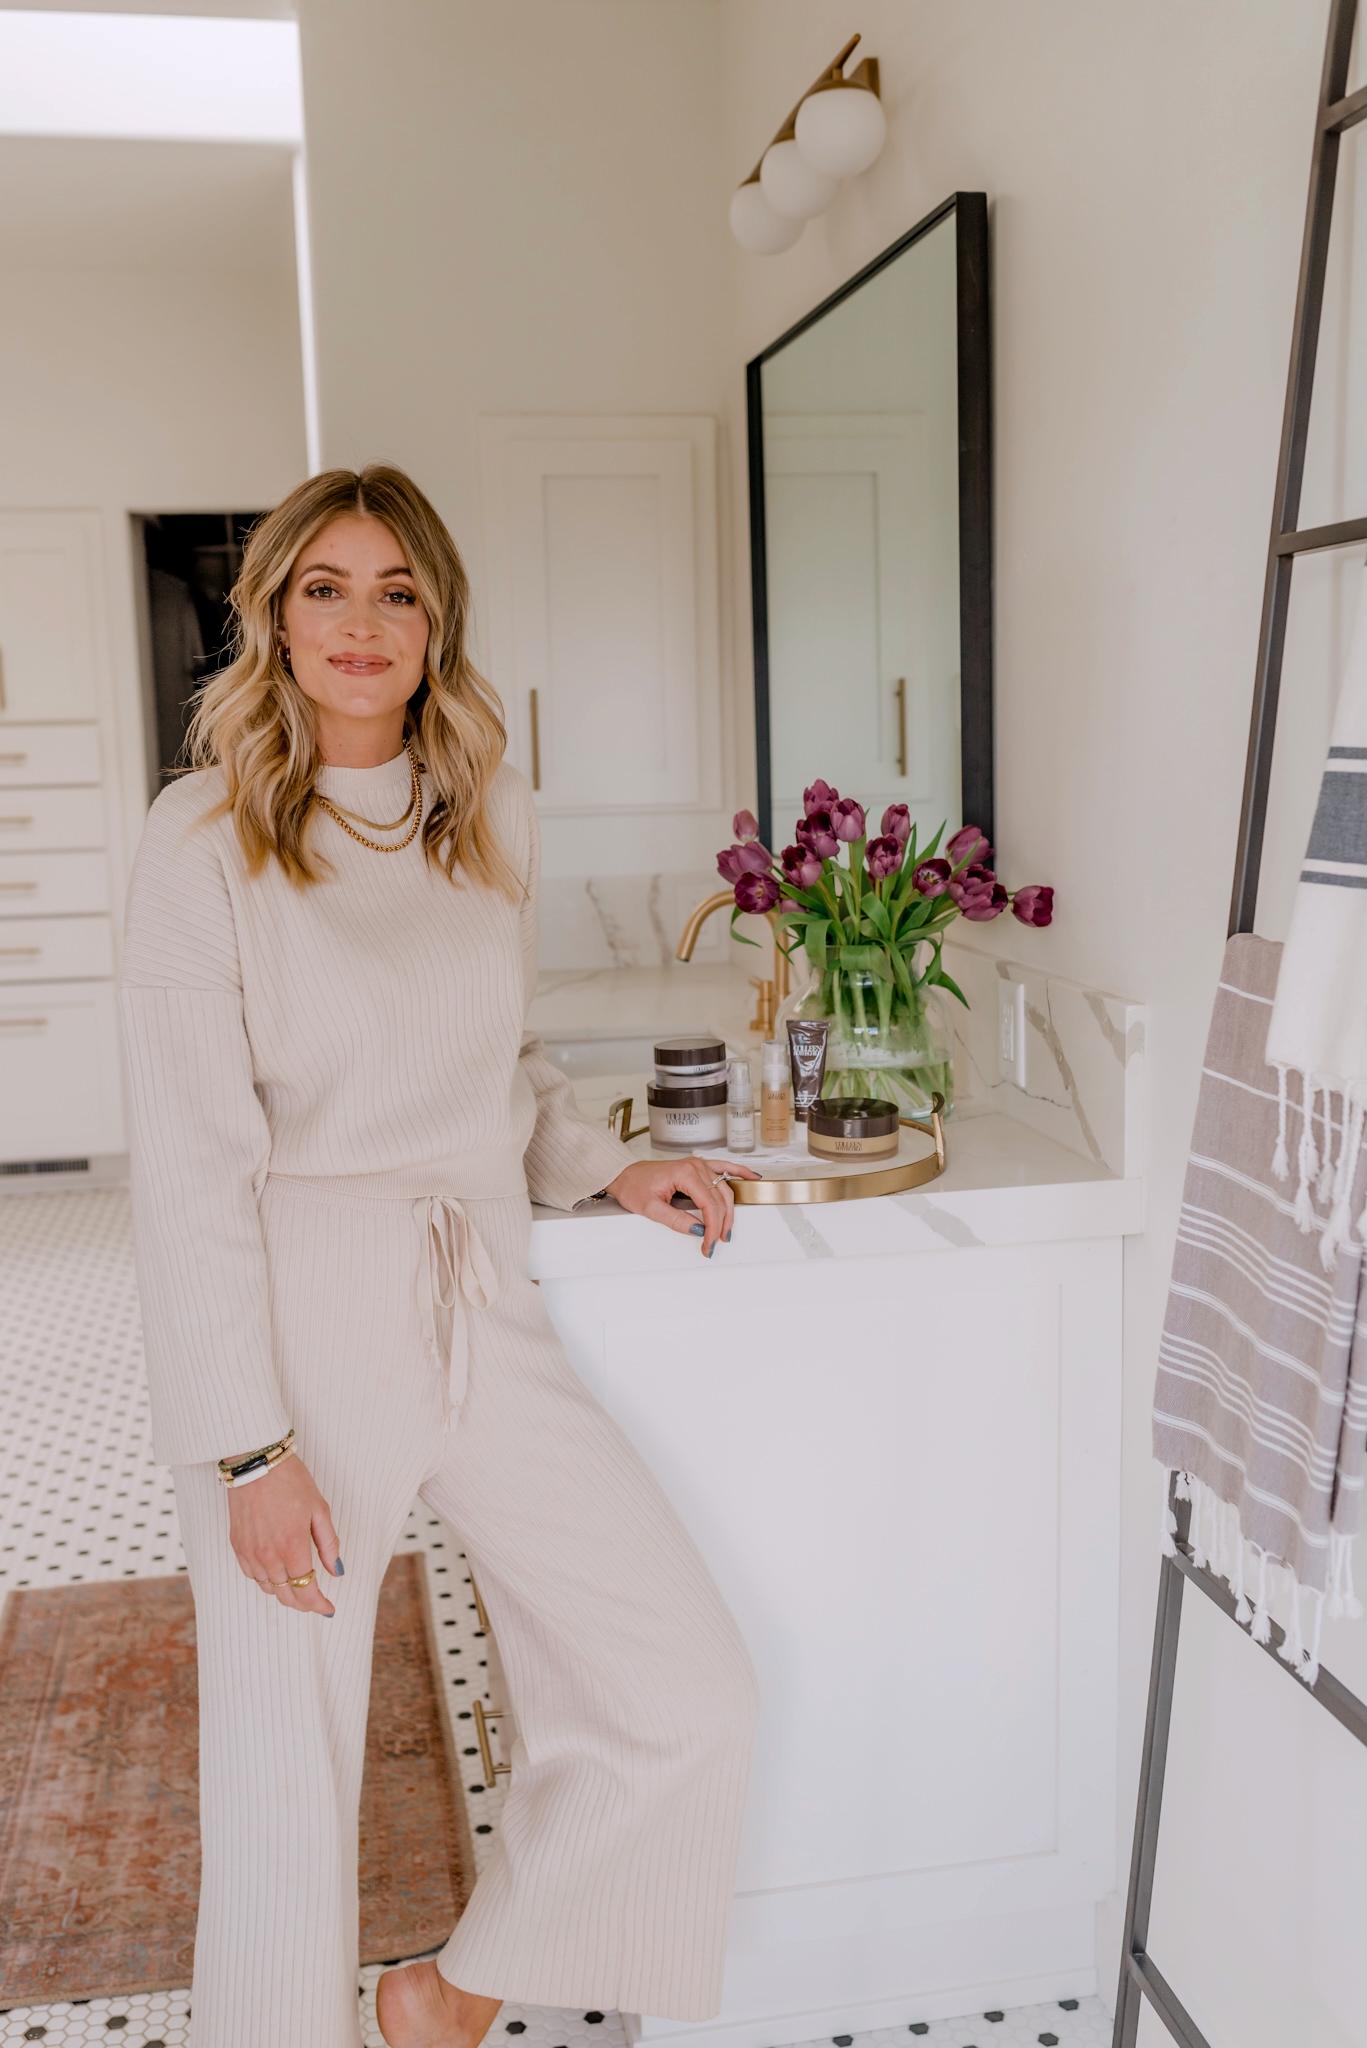 Colleen Rothschild skincare sale